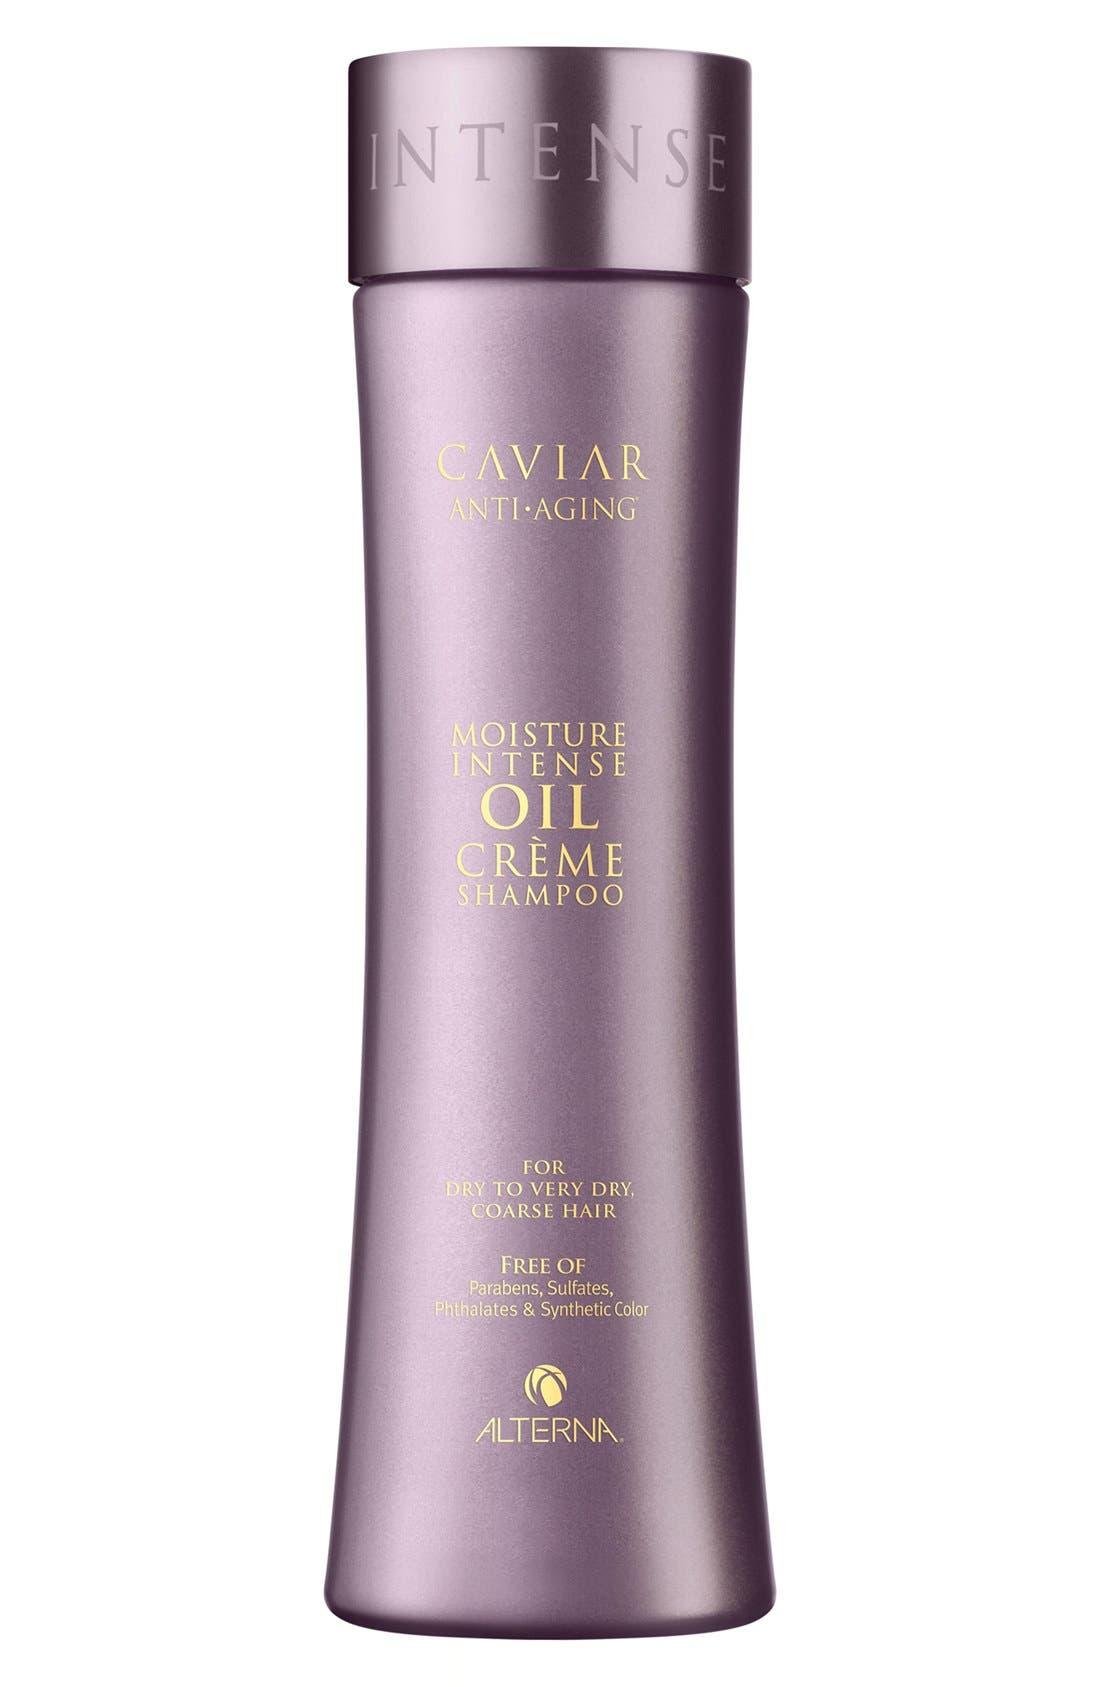 ALTERNA Caviar Anti-Aging Moisture Intense Oil Creme Shampoo,                         Main,                         color,